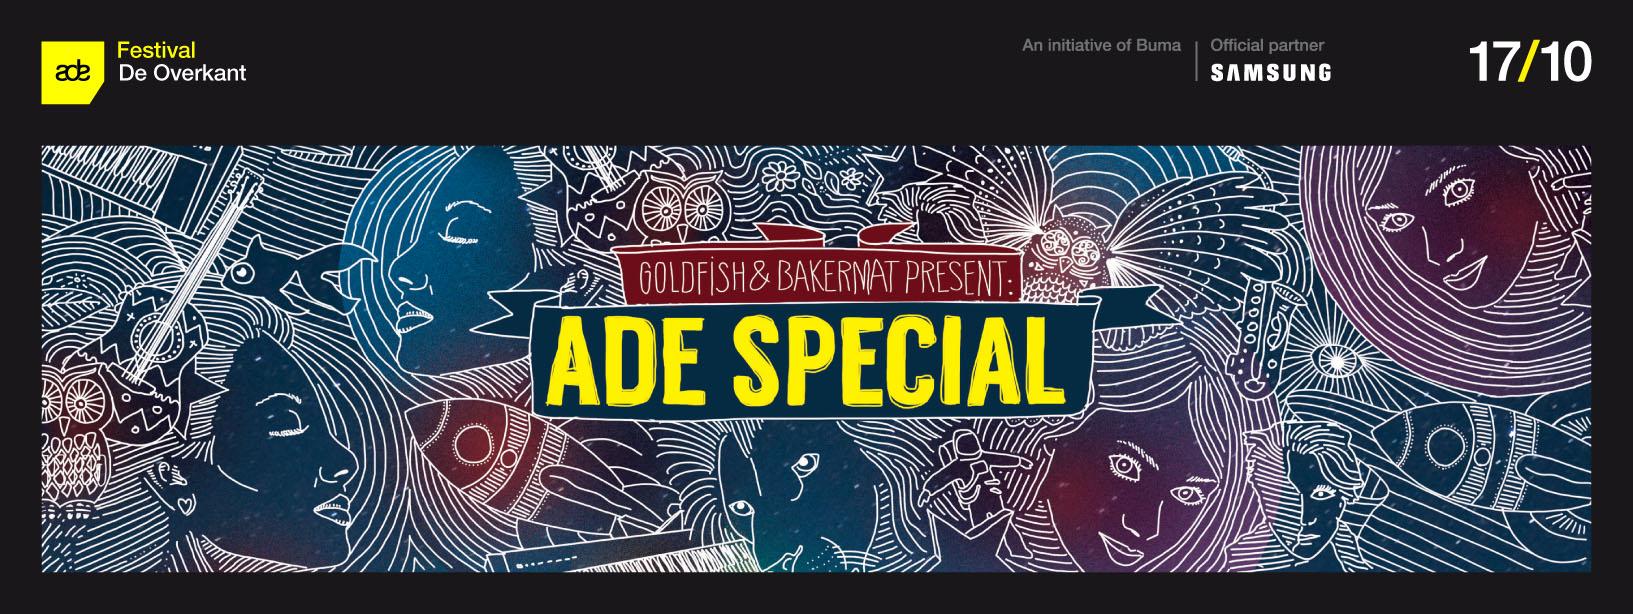 goldfish-ade-special